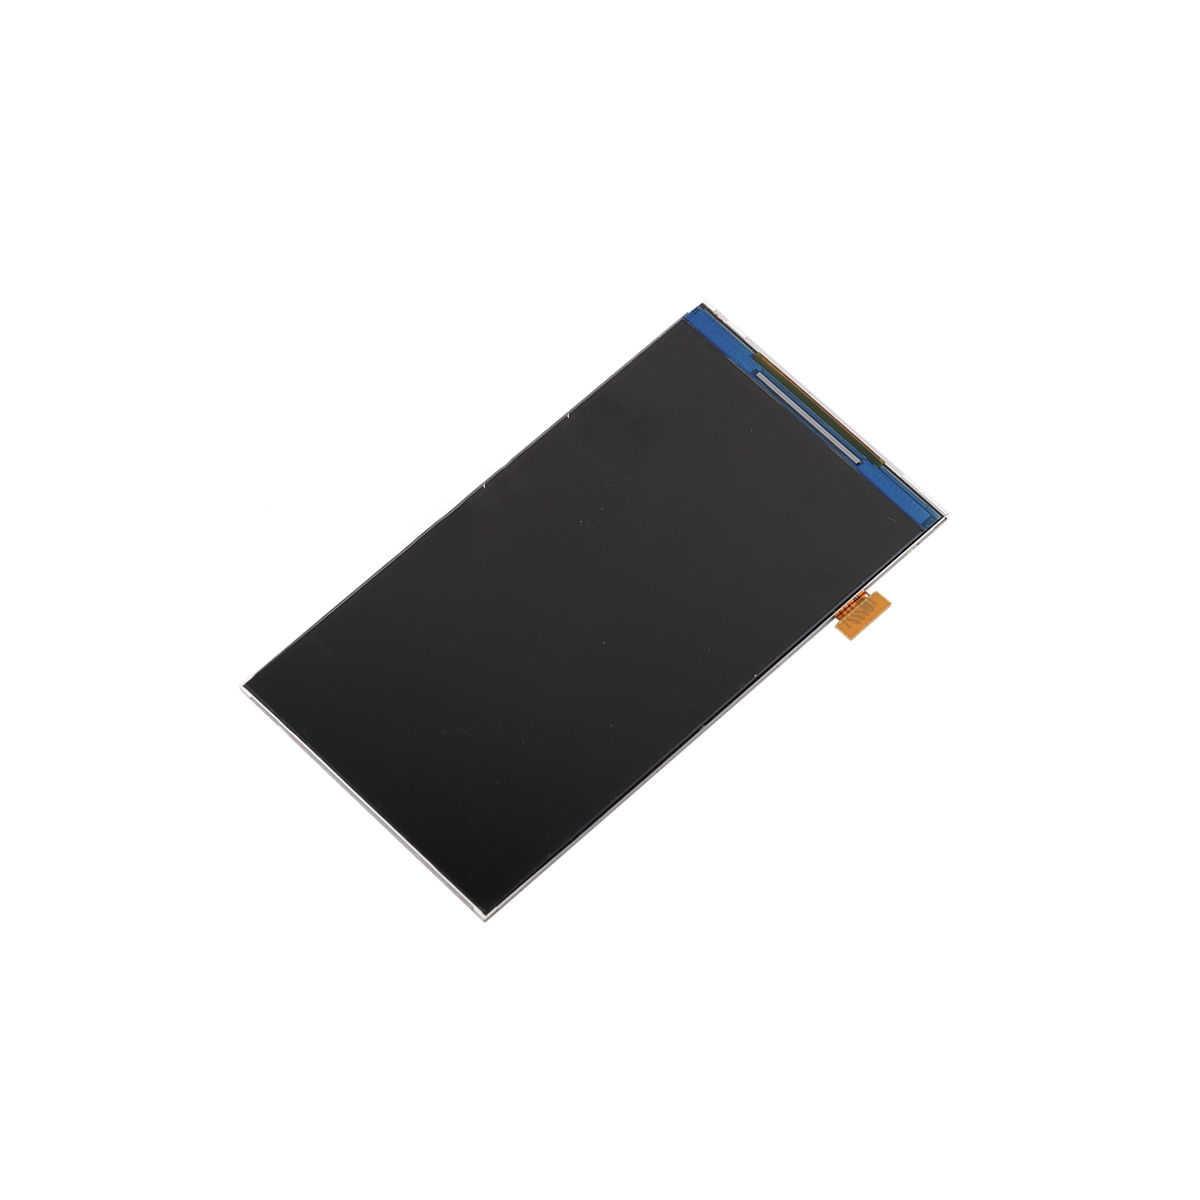 LCD תצוגת מסך מגע Digitizer עצרת לסמסונג גלקסי J2 ראש G532 G532M G532DS חדש באיכות גבוהה חלק